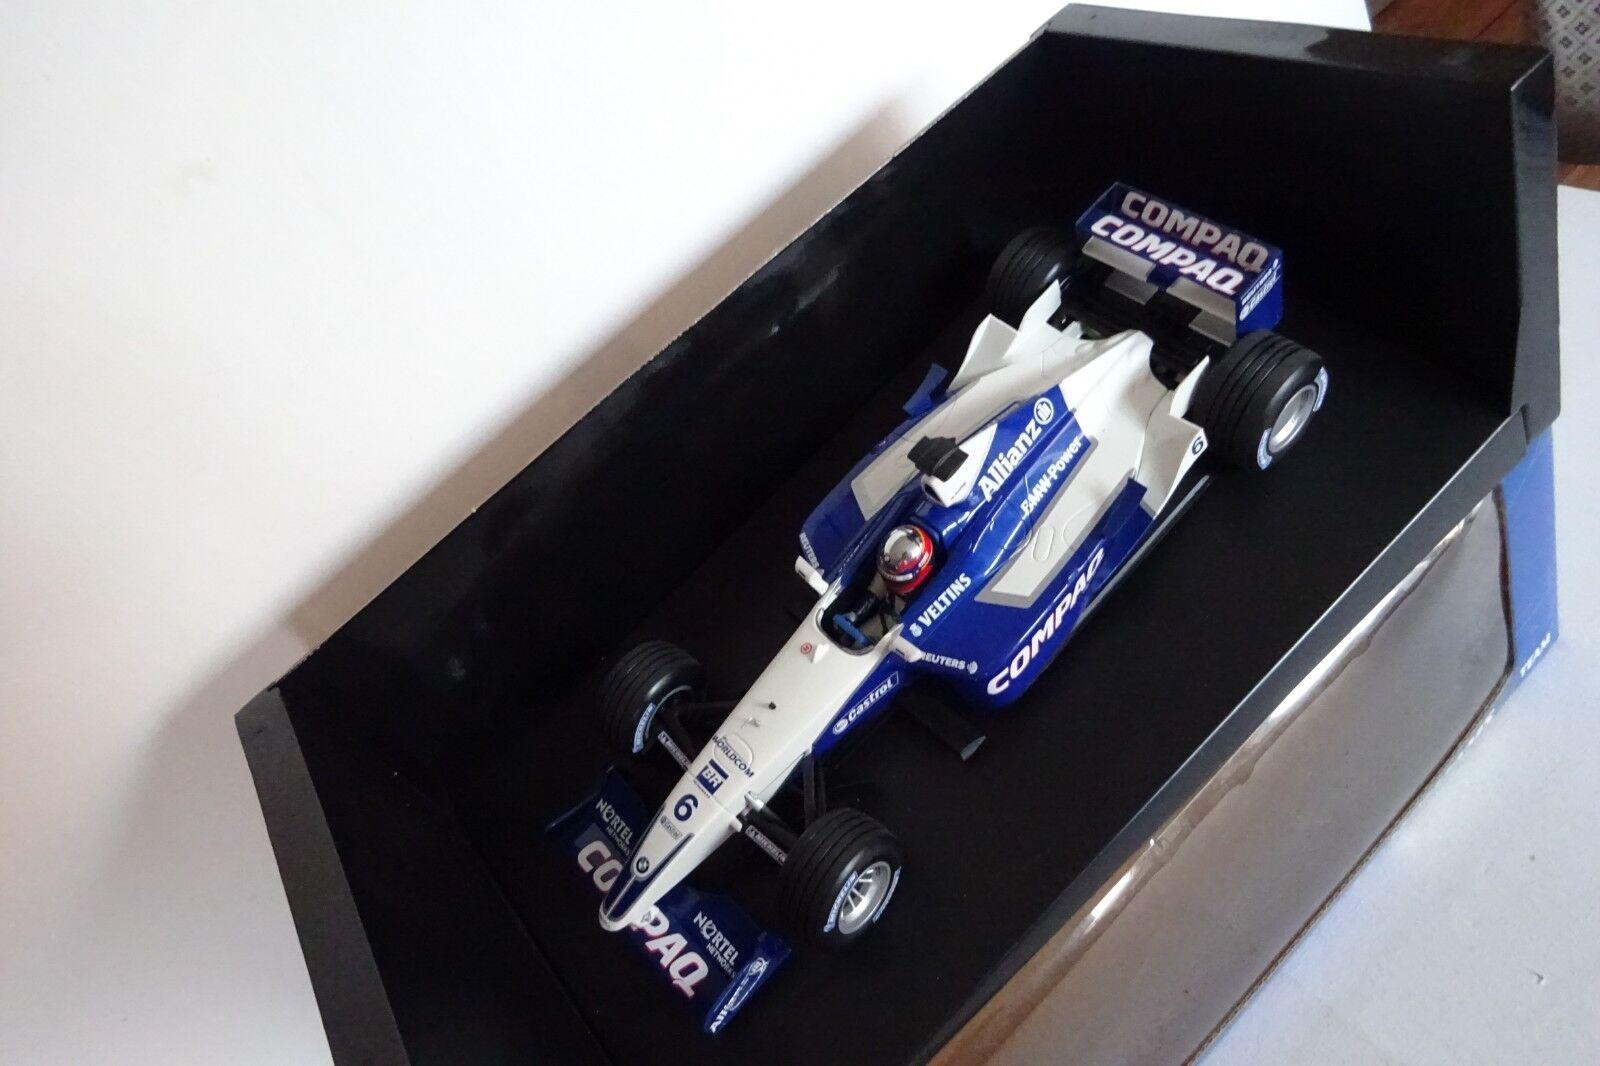 1 18 Minichamps Williams F1 BMW FW23 J.P. MonJuguetea 038134 NEW